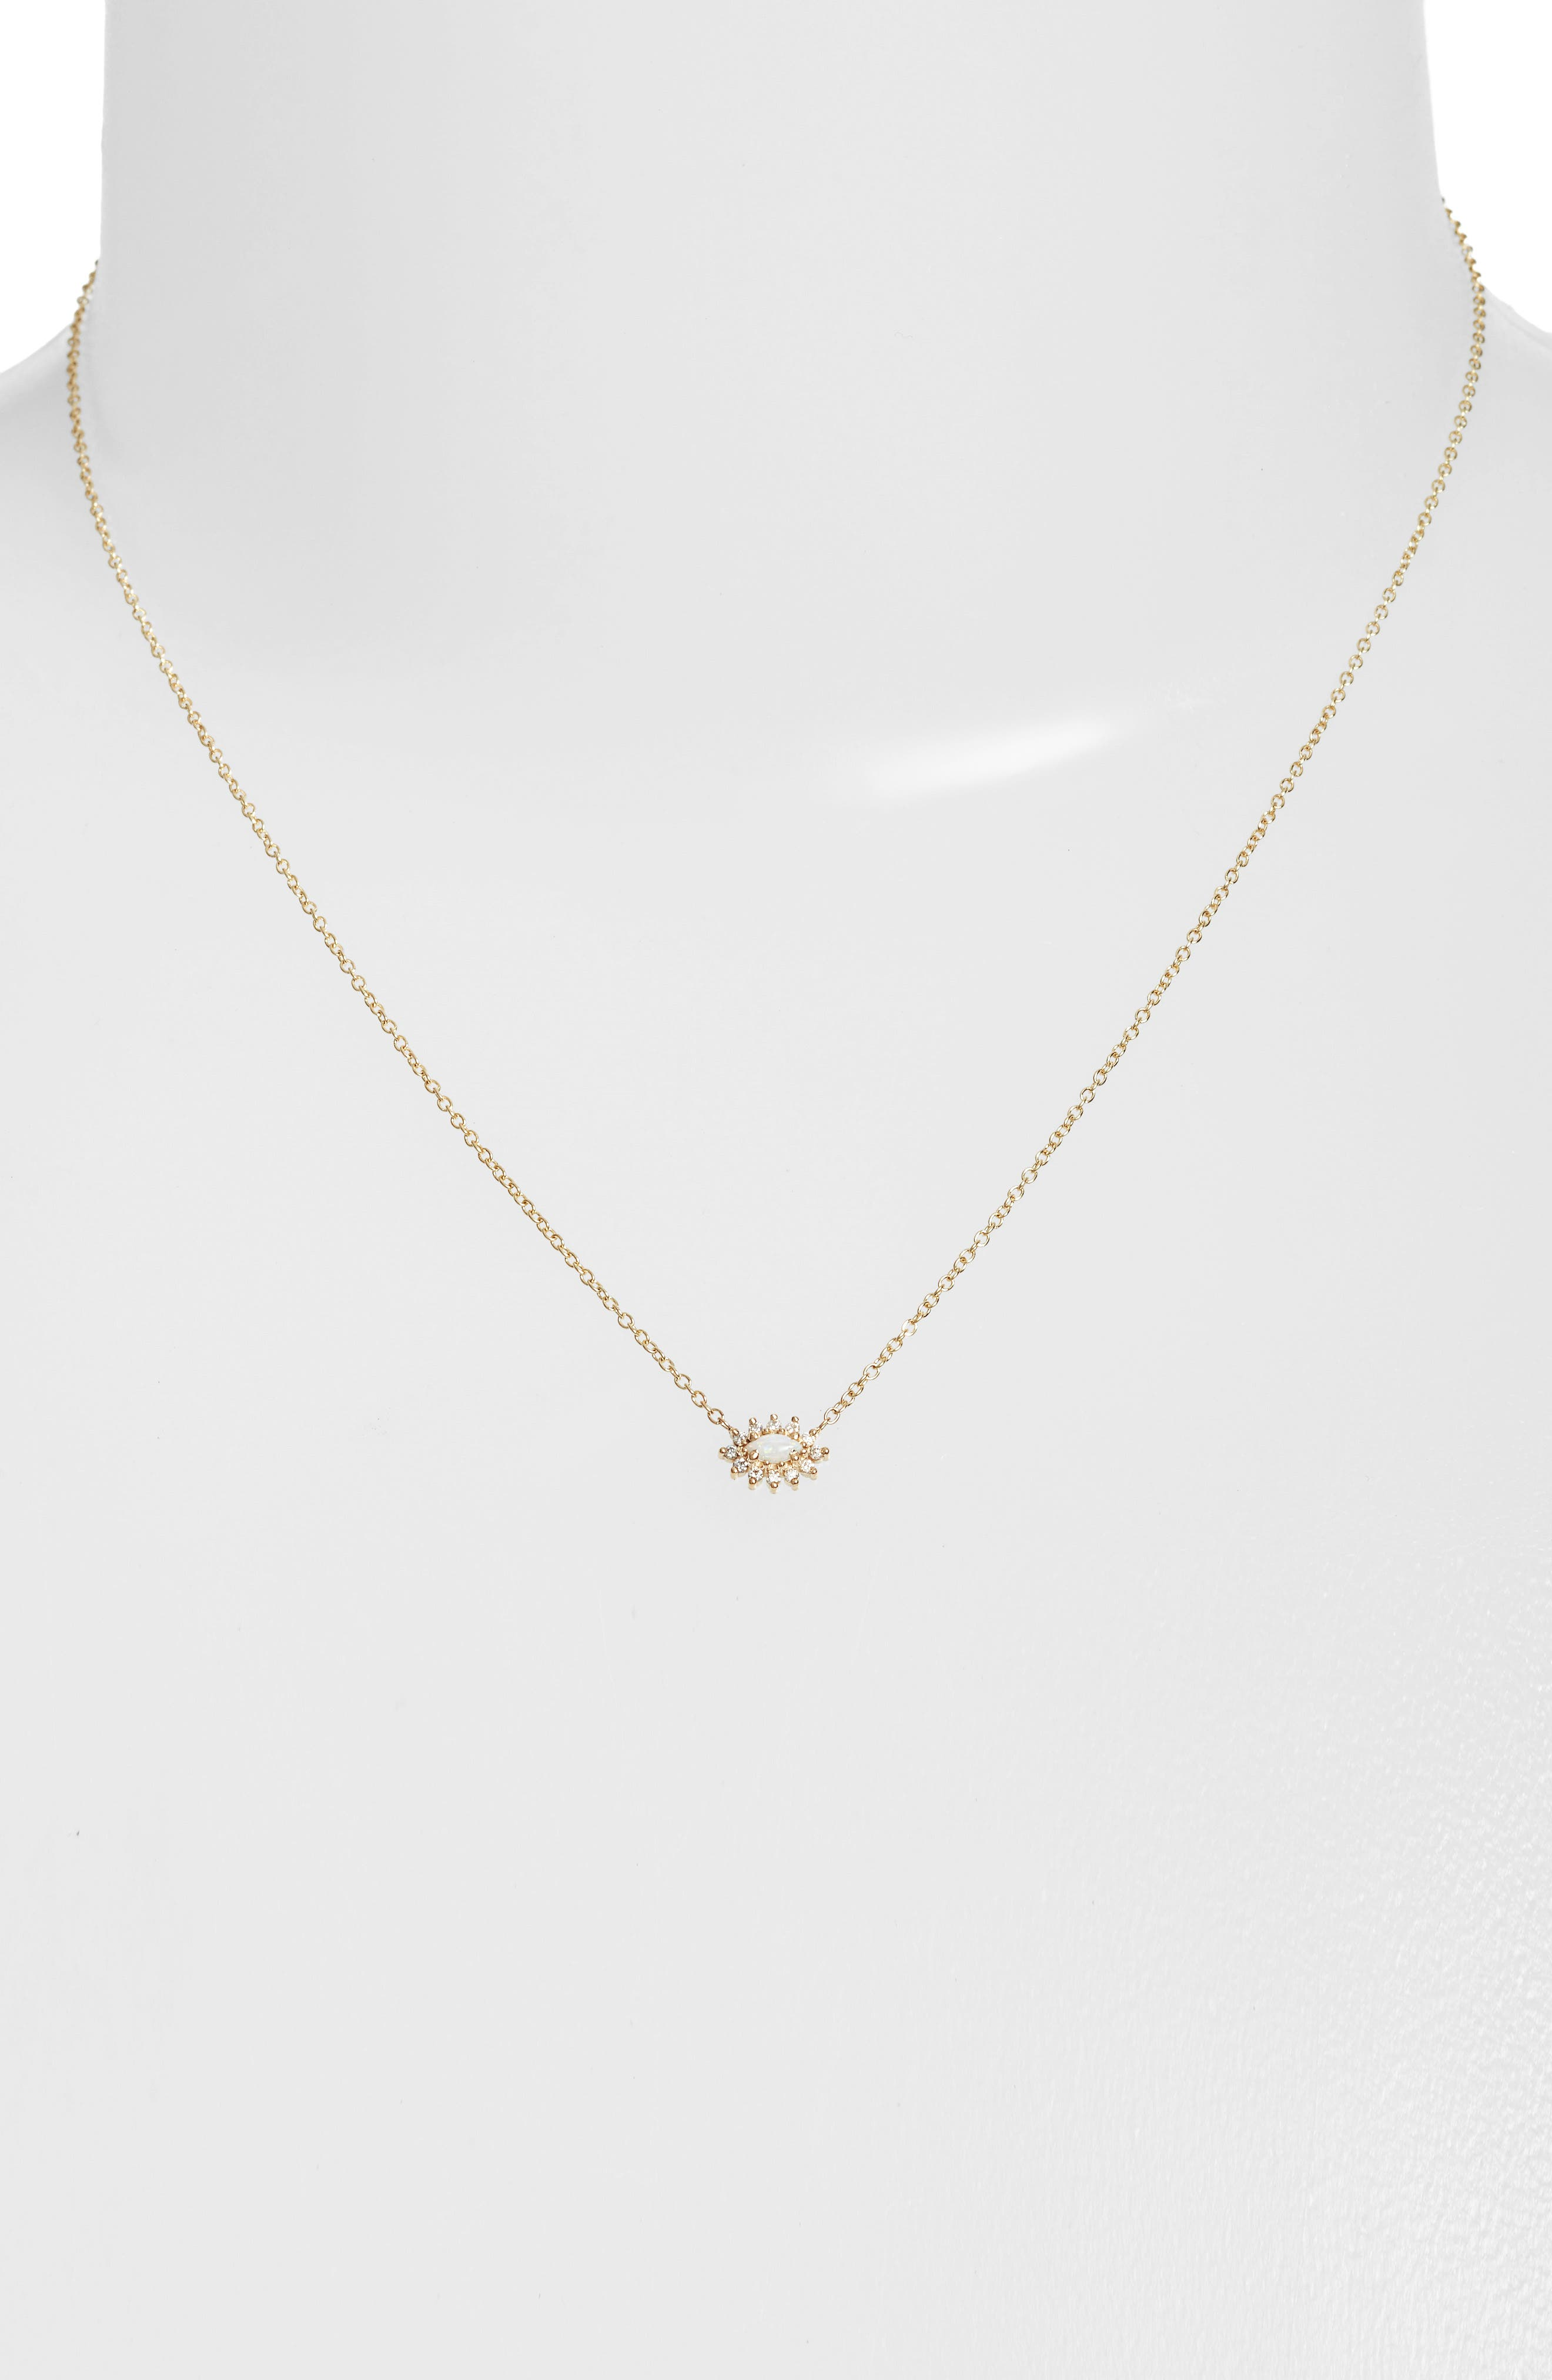 Zoë Chicco Diamond & Opal Cluster Pendant Necklace (Nordstrom Exclusive)